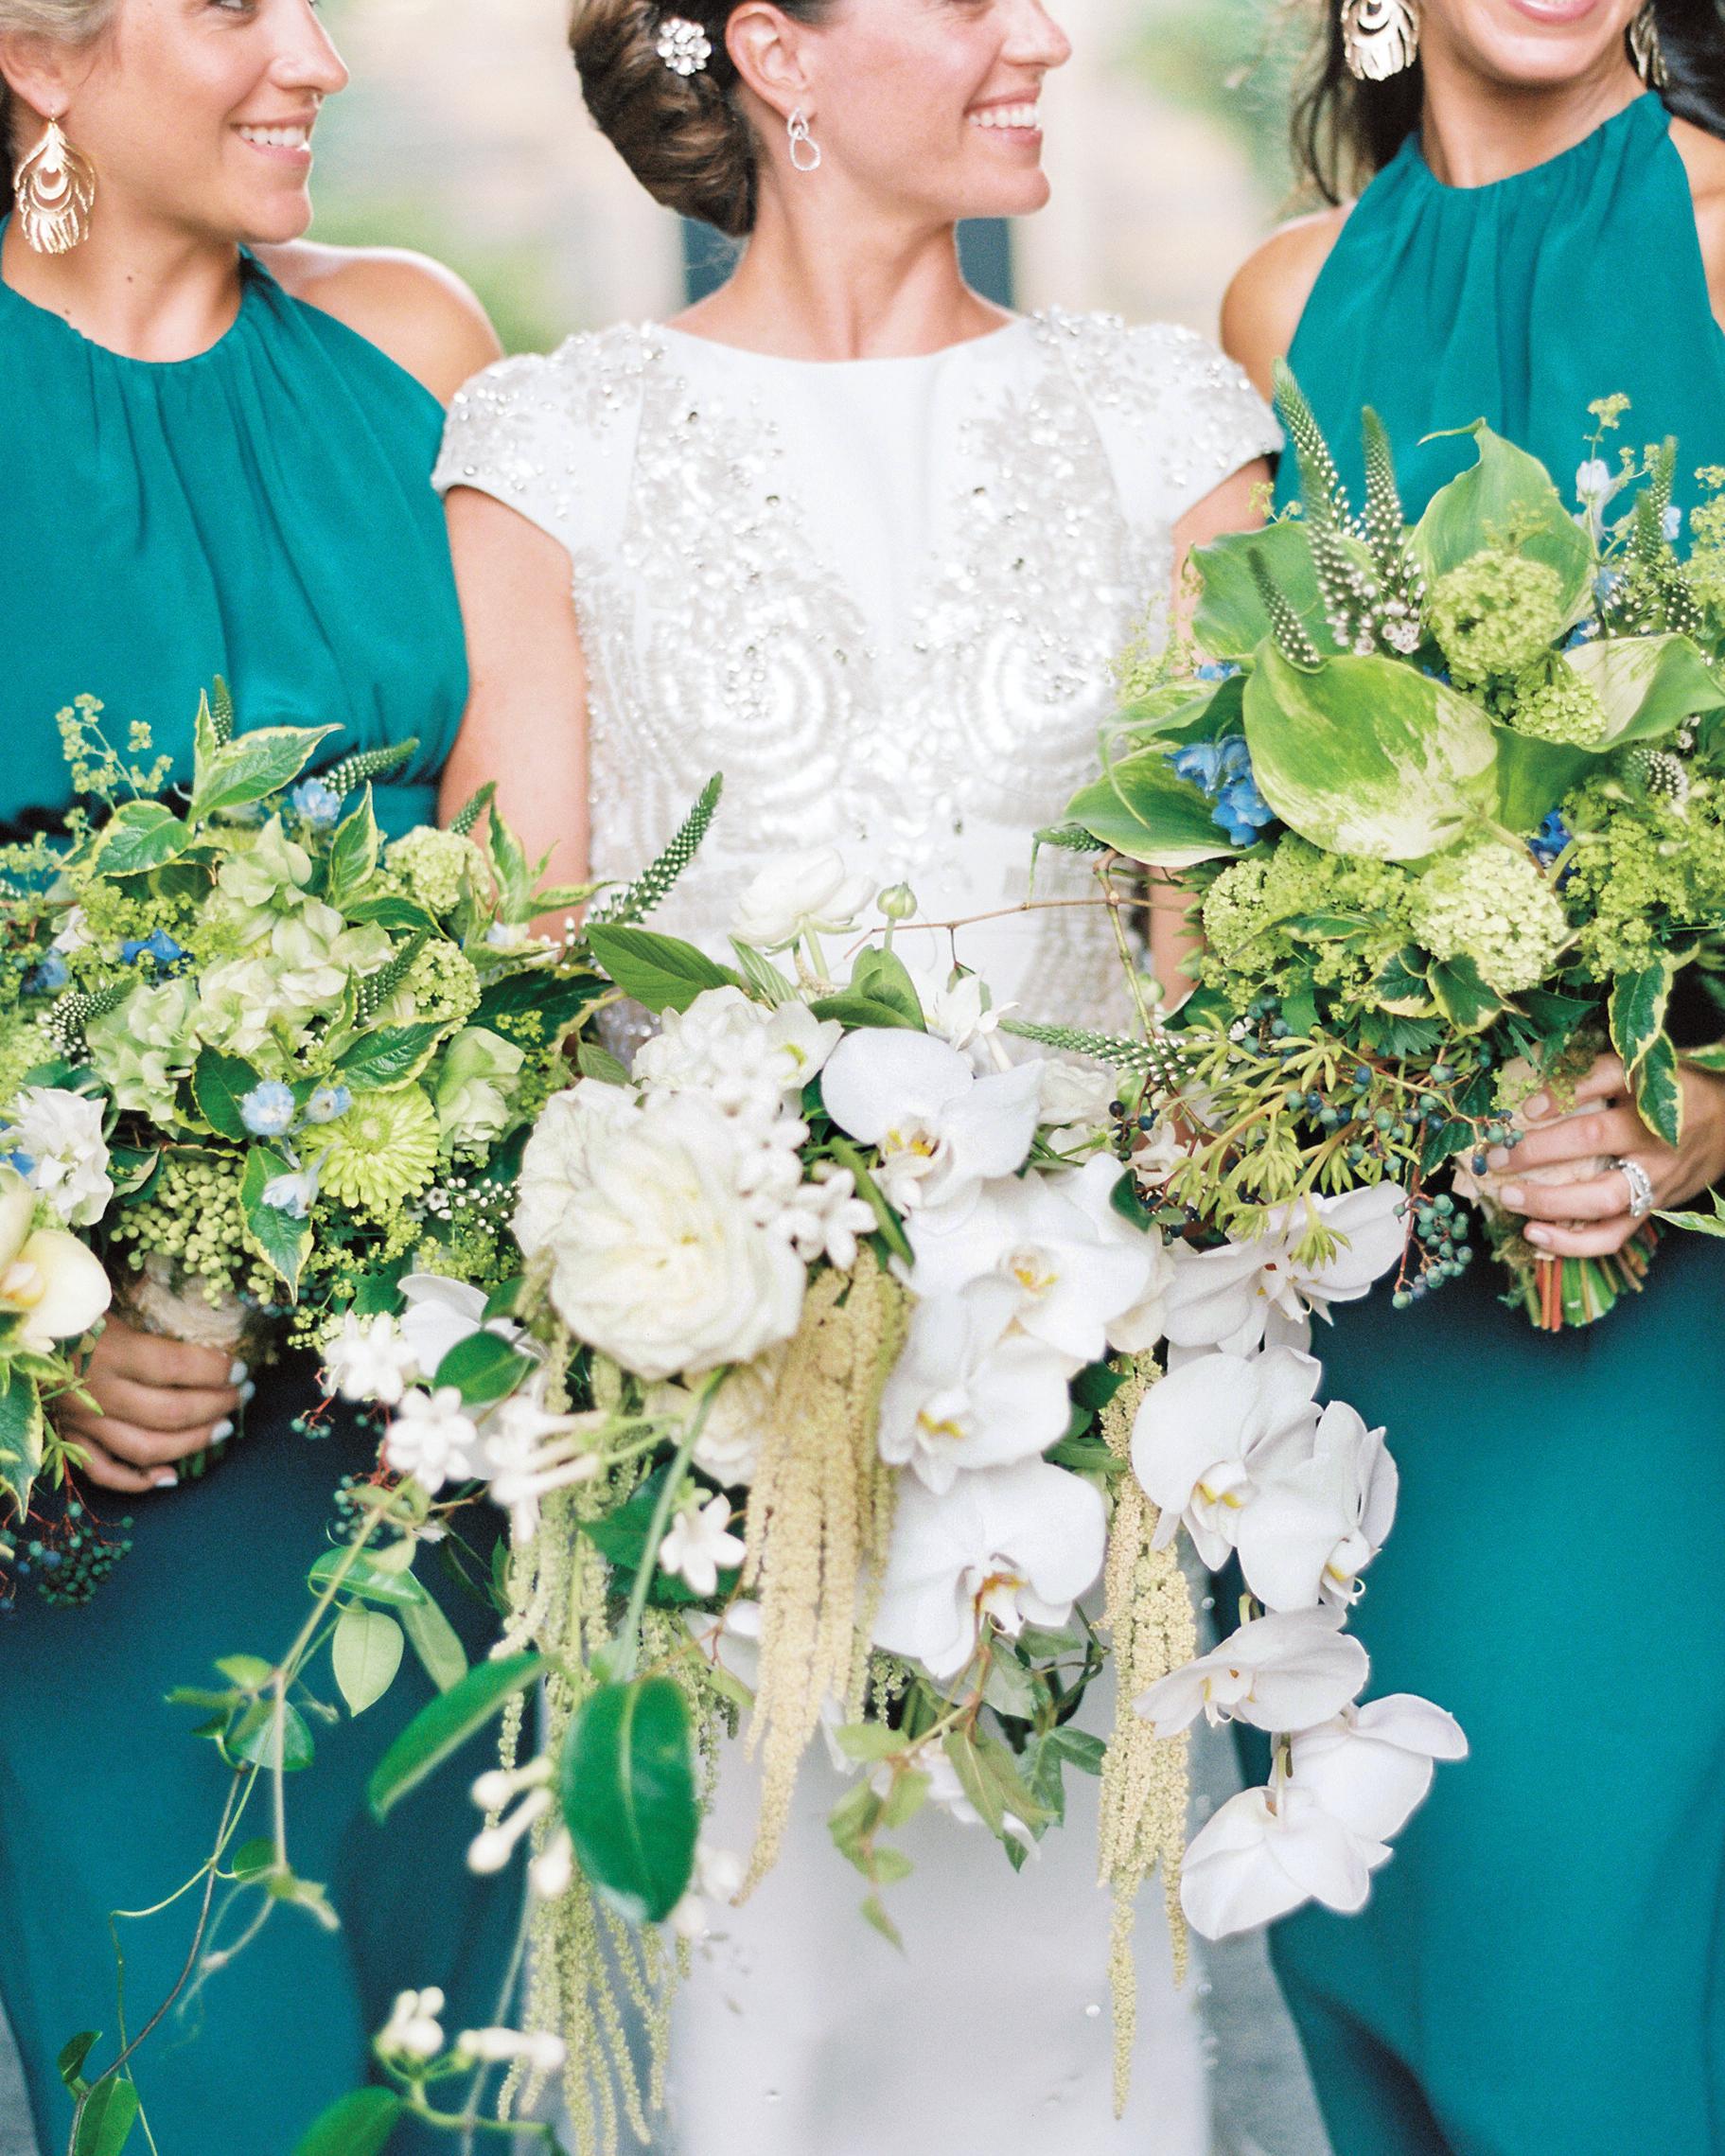 molly-thomas-bouquets-mwds109687.jpg